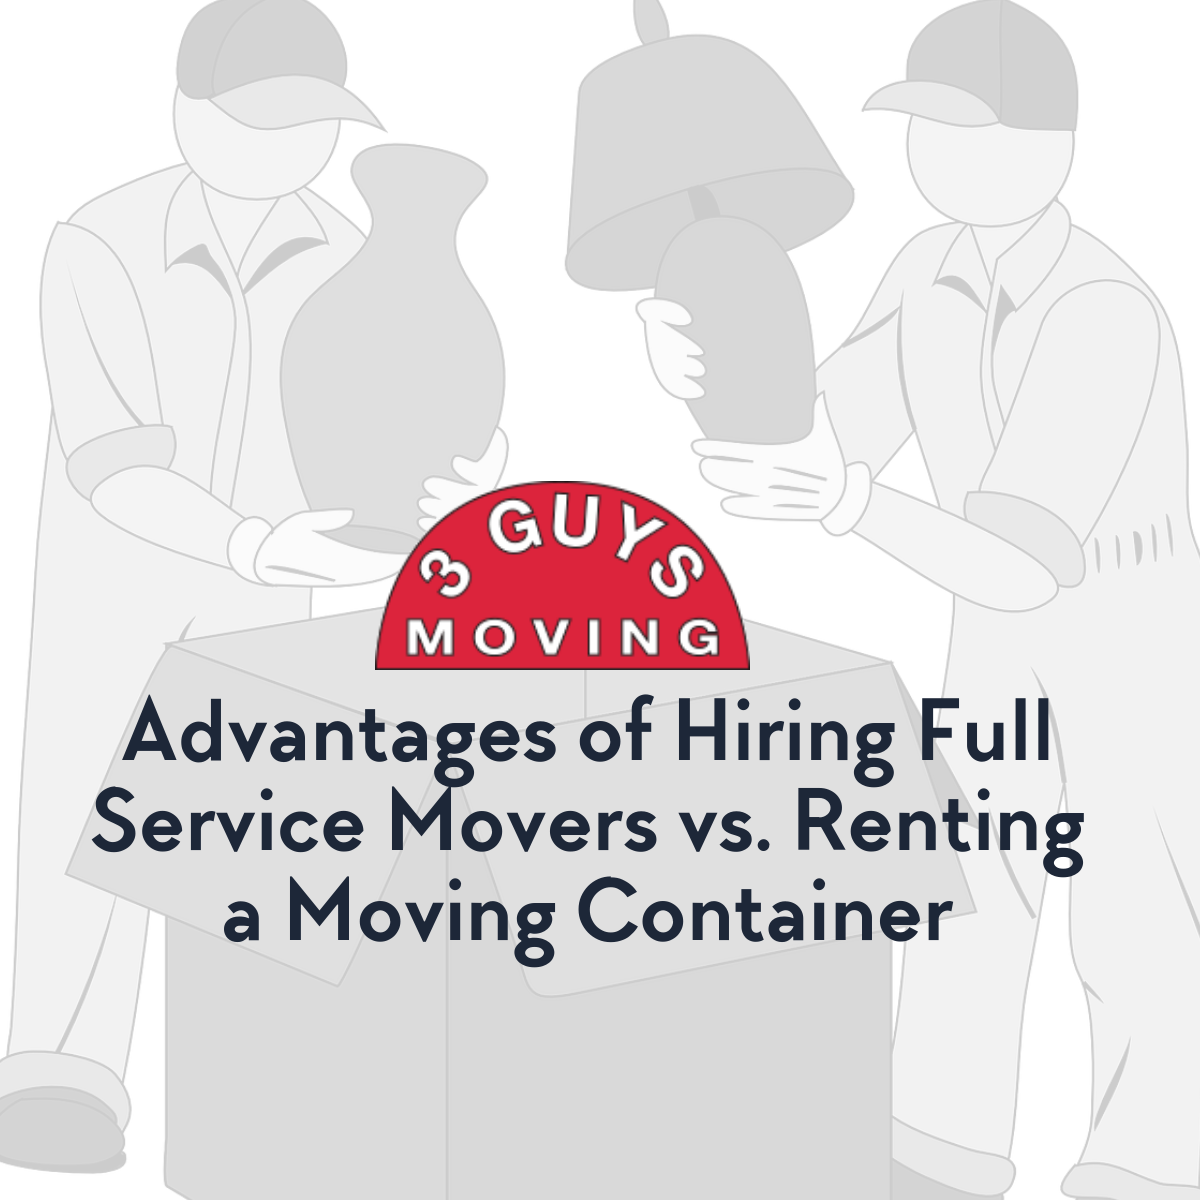 Advantages of Hiring Full Service Movers vs. Renting a Moving Container - Advantages of Hiring Full Service Movers vs. Renting a Moving Container